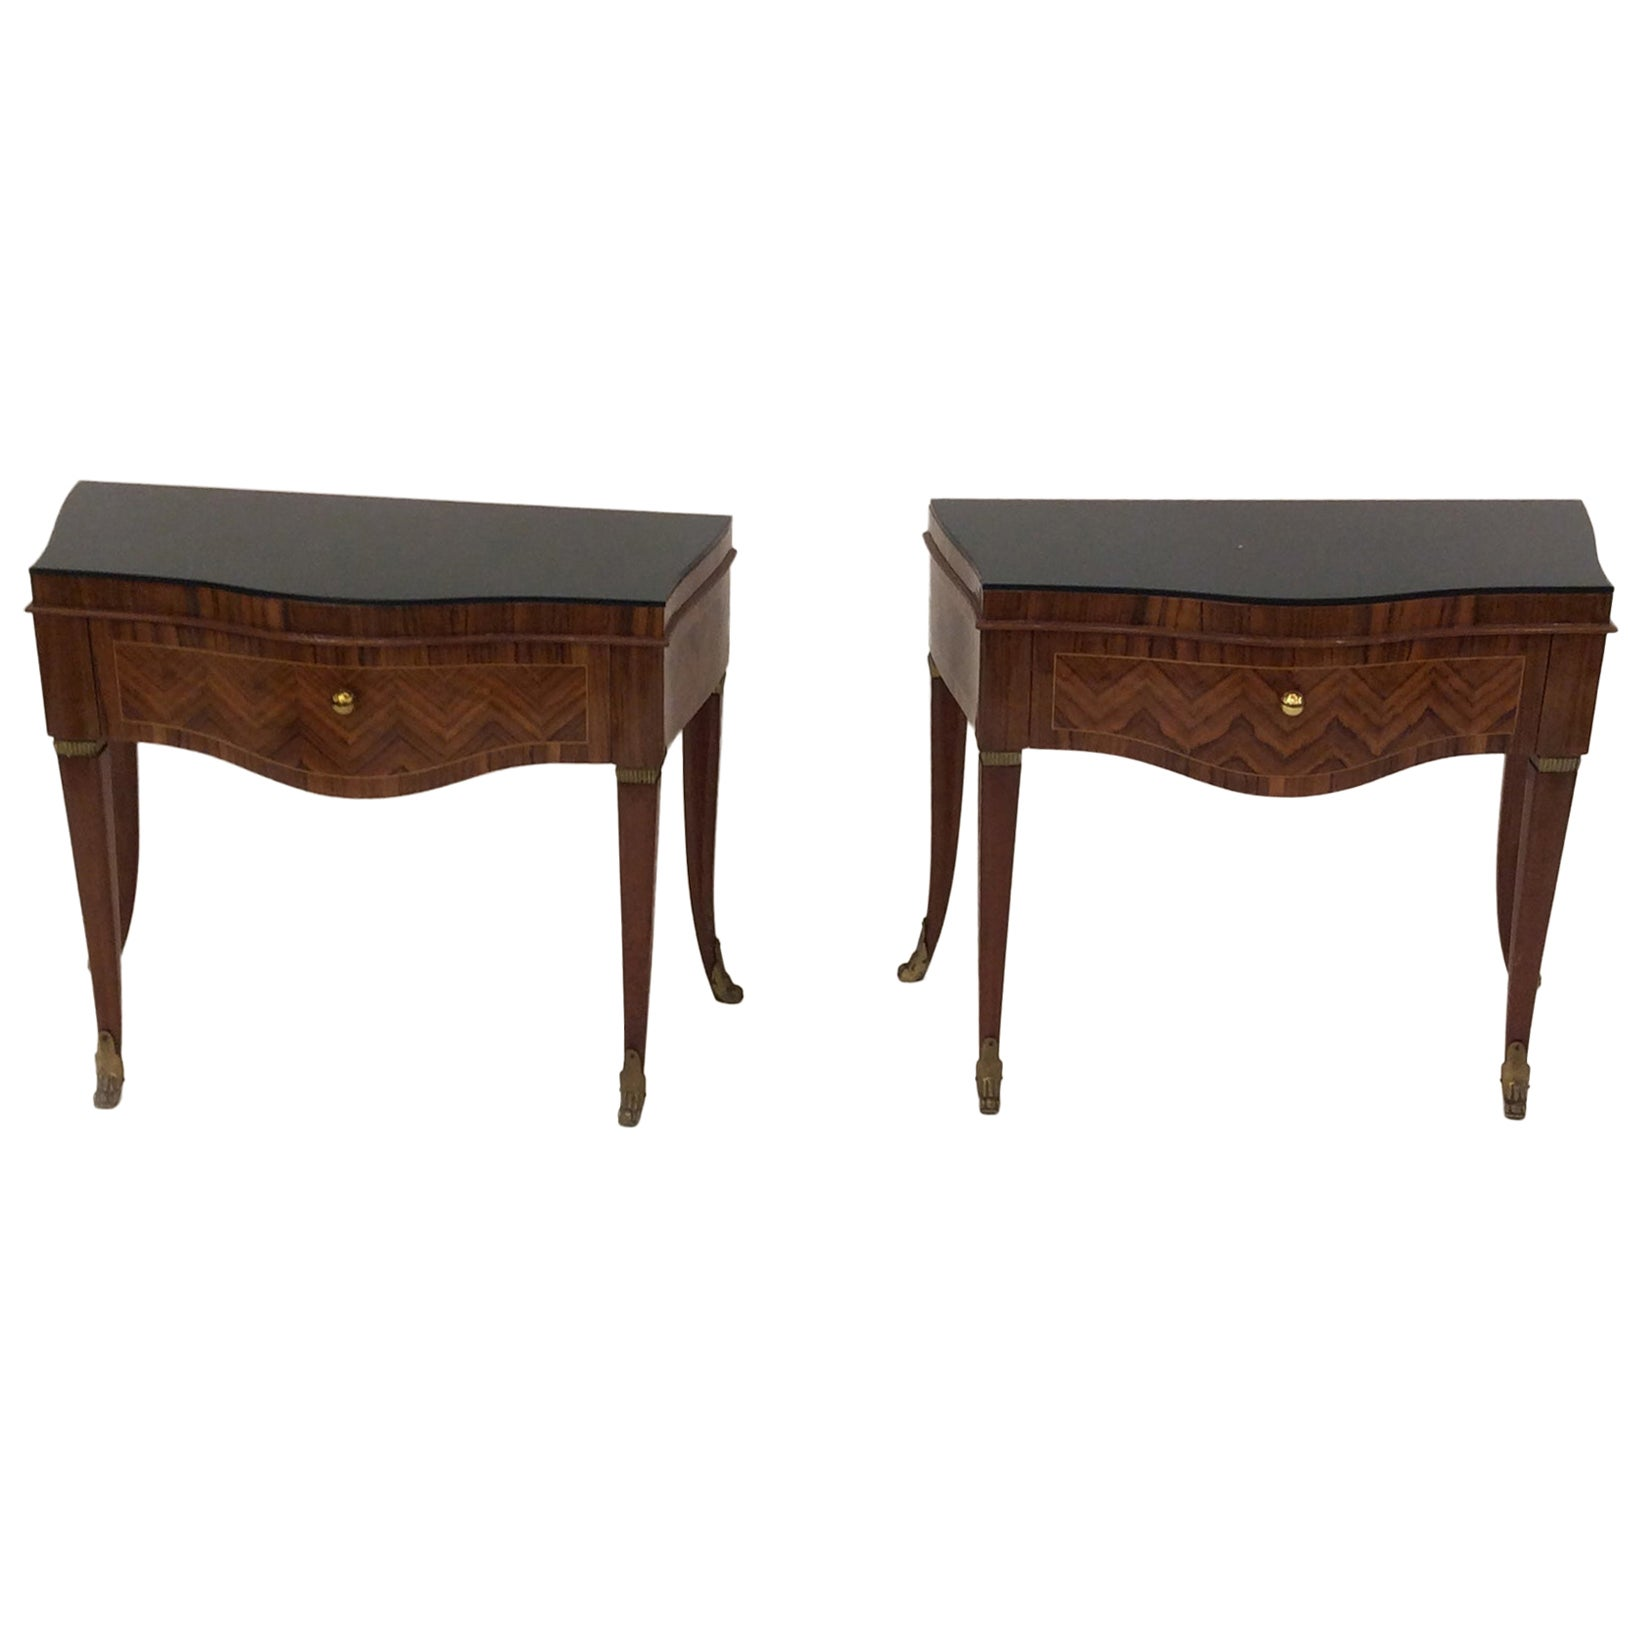 Italian Side Tables/Nightstands, 1940s